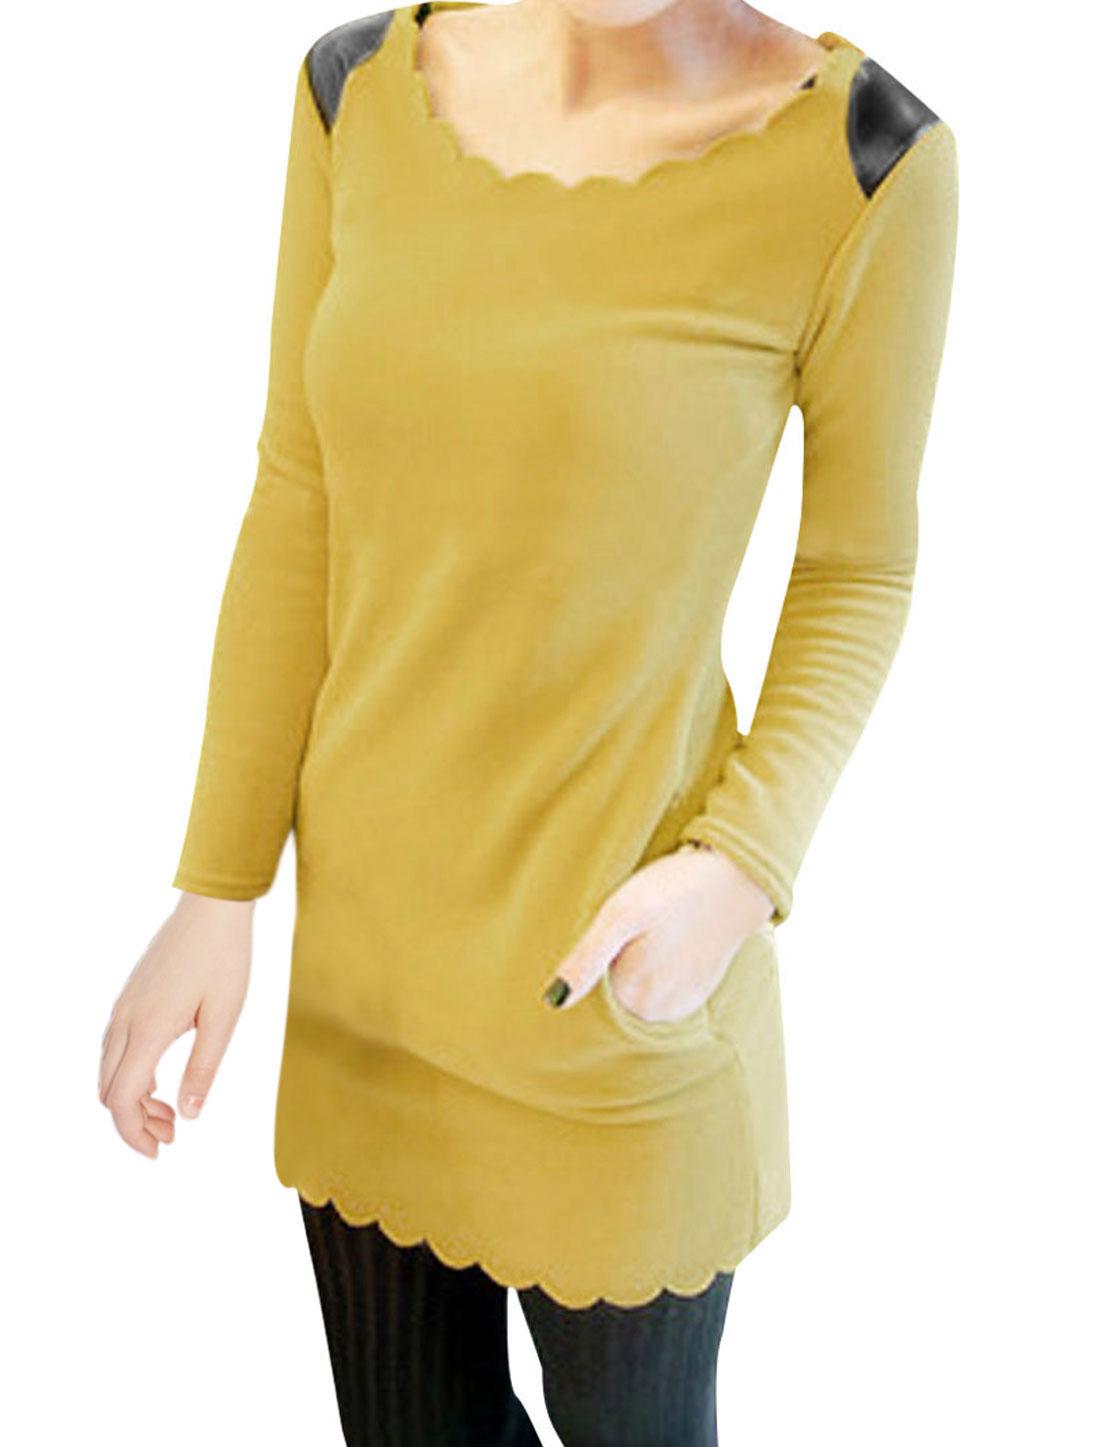 Ladies Yellow Fleece Inner Casual Pullover Autumn Tunic Shirt XS